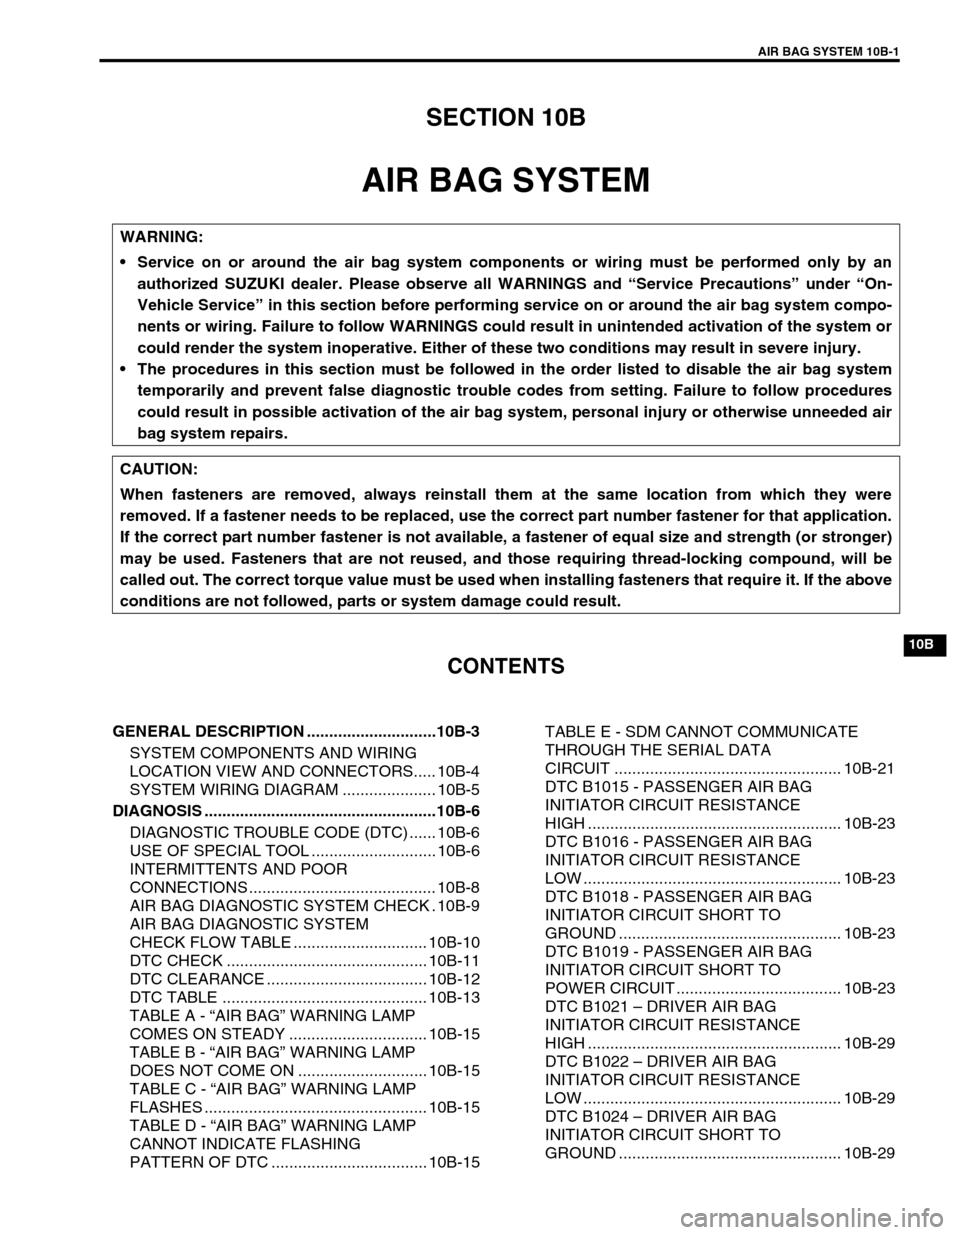 SUZUKI SWIFT 2000 1.G Transmission Service Workshop Manual, Page 375